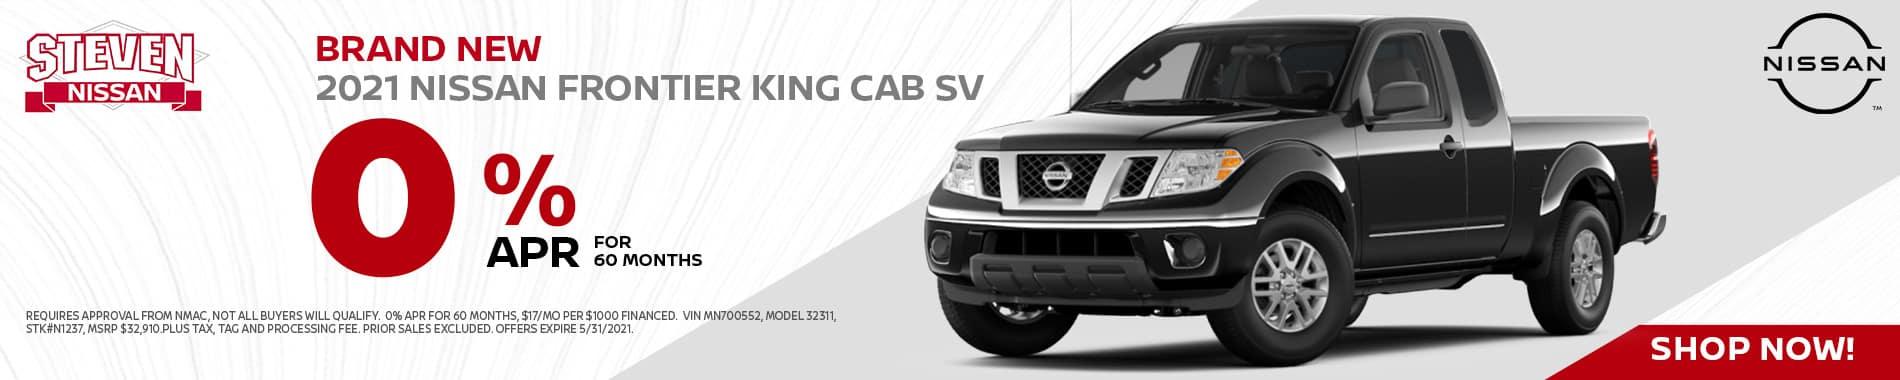 05_21_Steven_Nissan-2021-Nissan-Frontier-King-Cab-SV